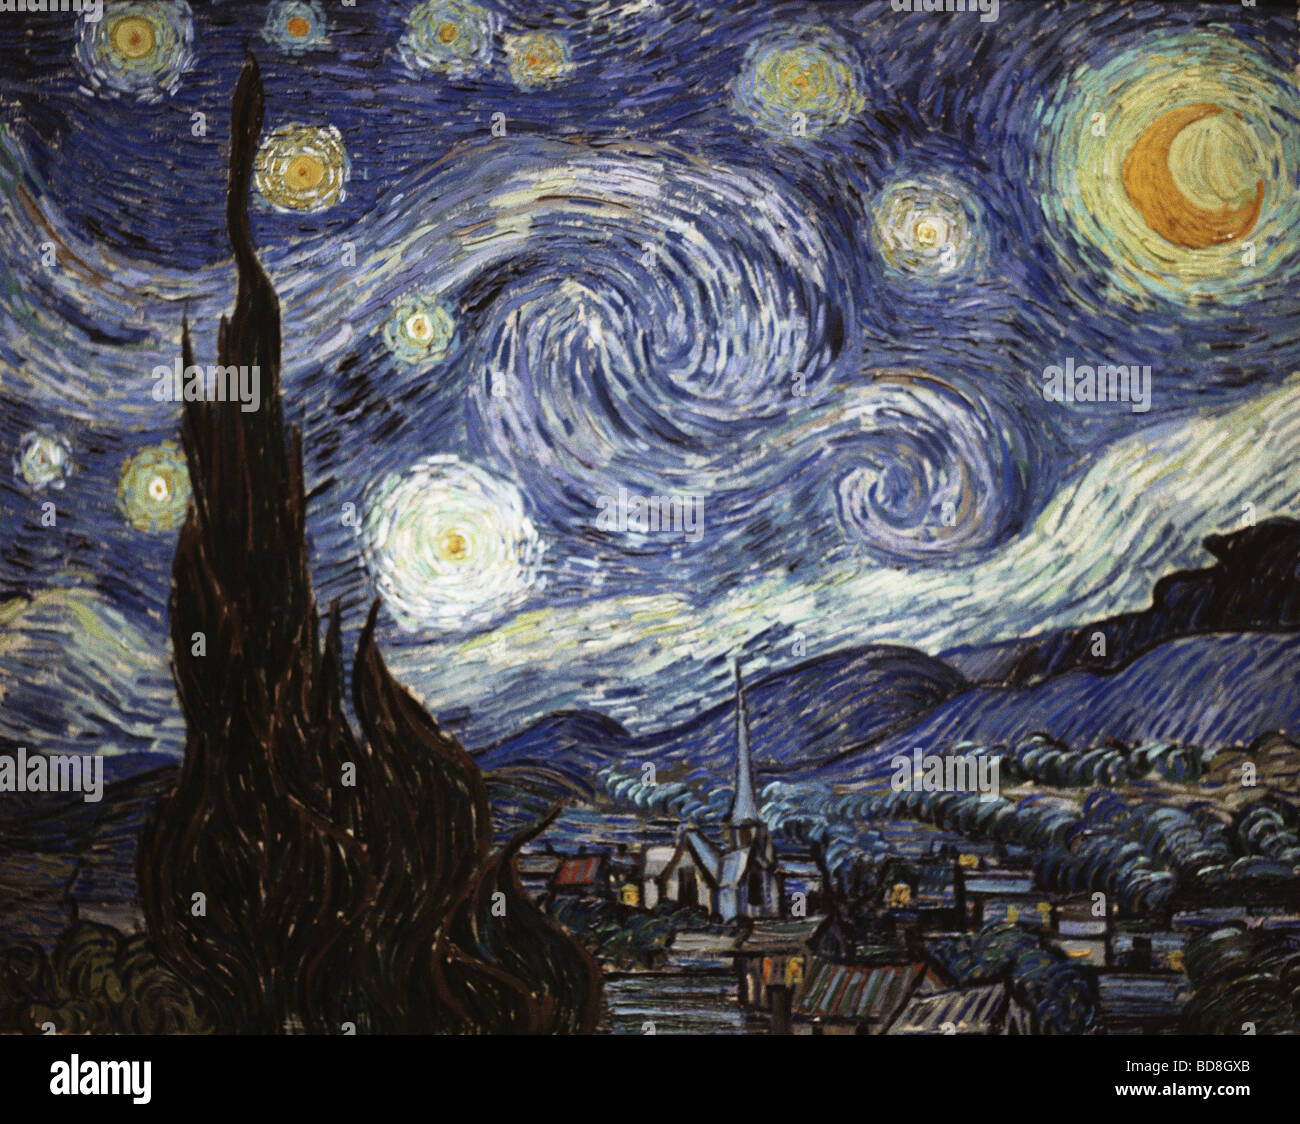 "Bildende Kunst, Gogh, Vincent van, (1853 - 1890), Malerei, ""Sternennacht"", Öl auf Leinwand, 73 x Stockbild"